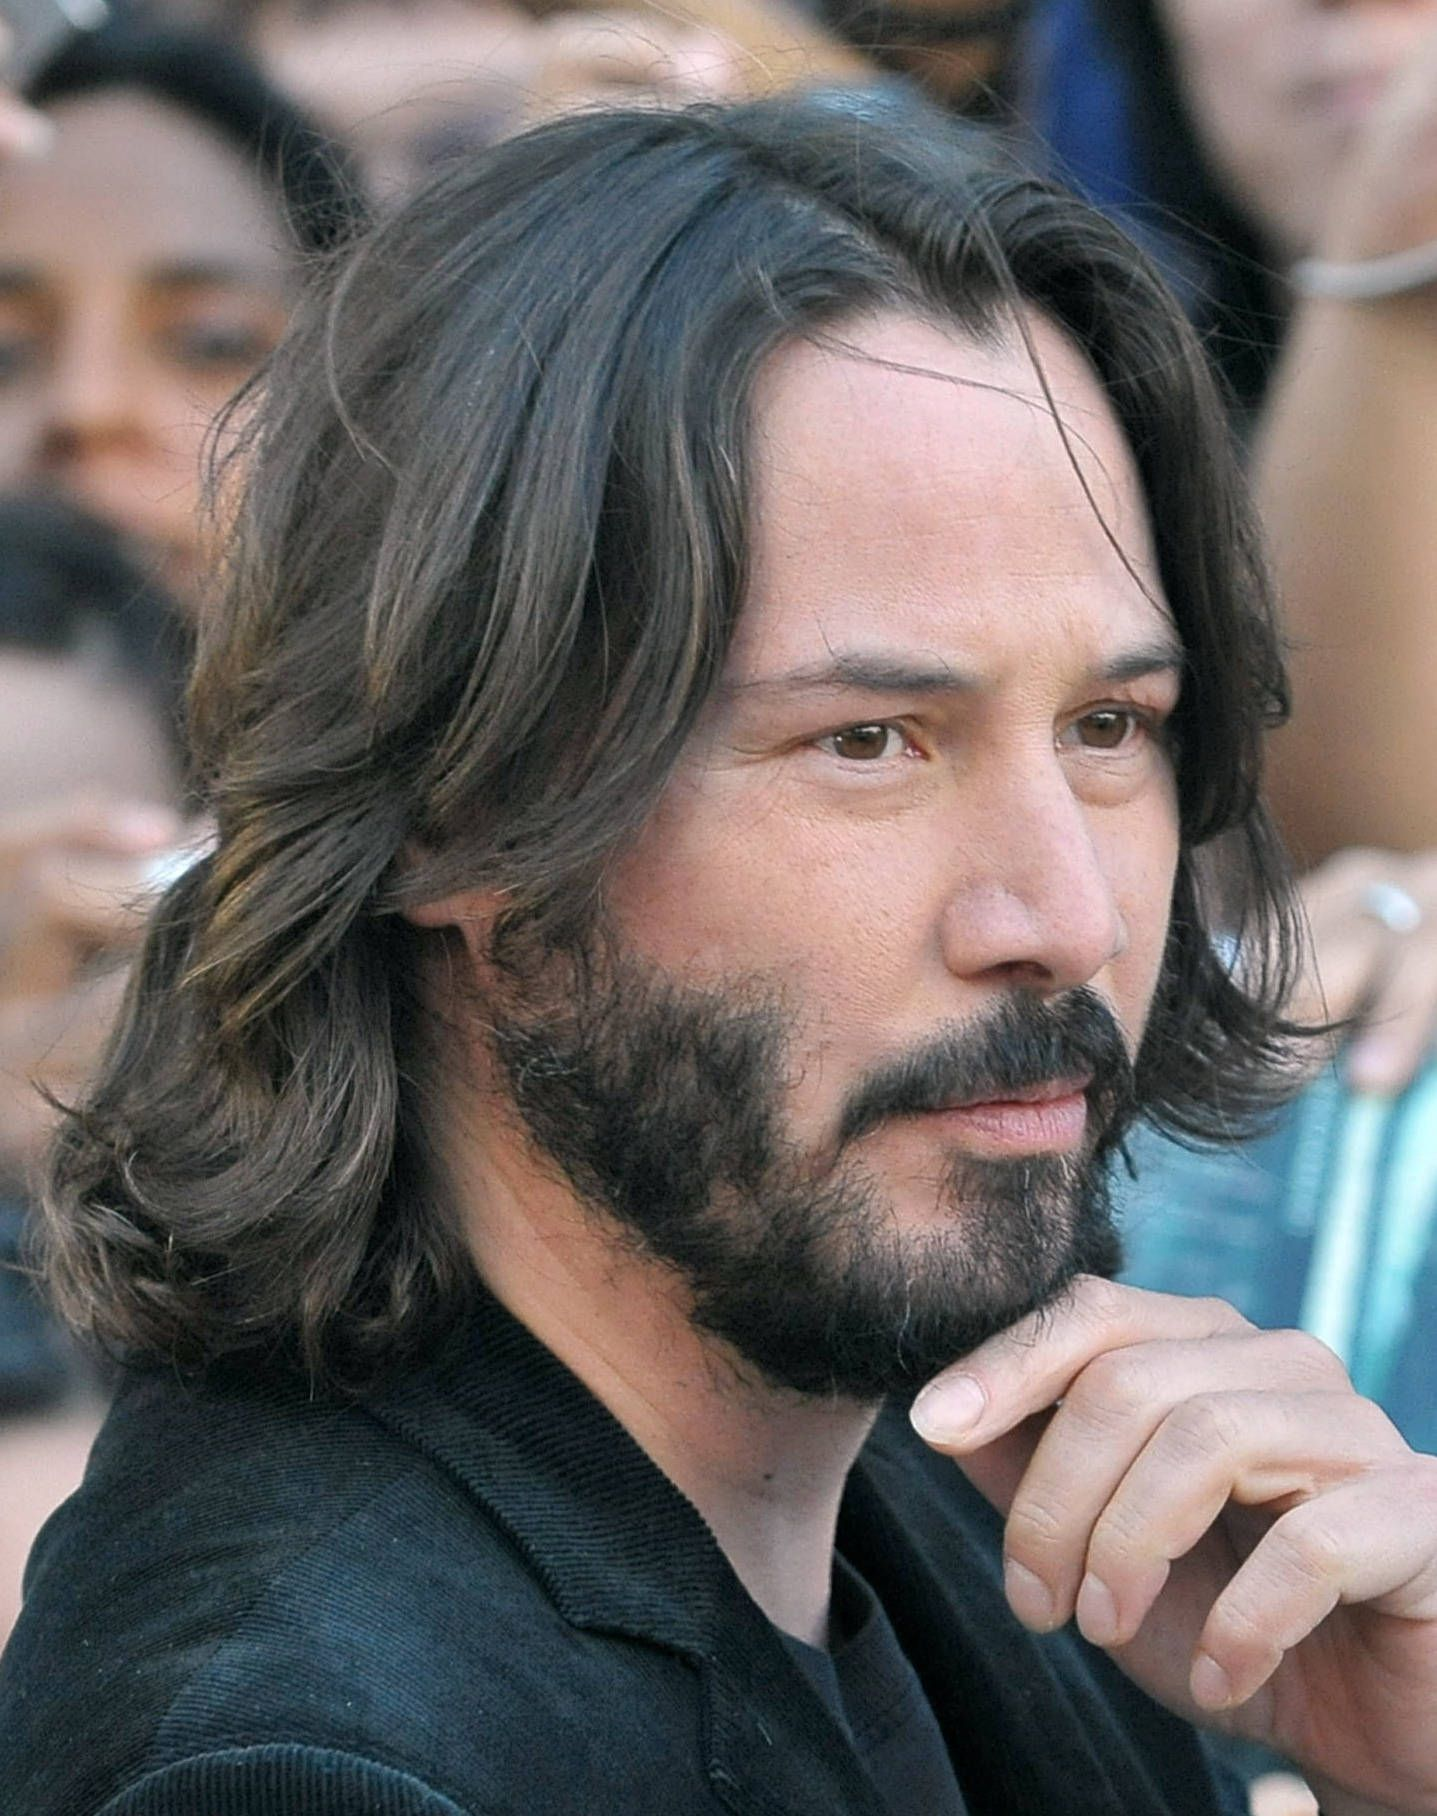 Menus Long Hairstyles  More Long Hairstyles for Men  Good Looking